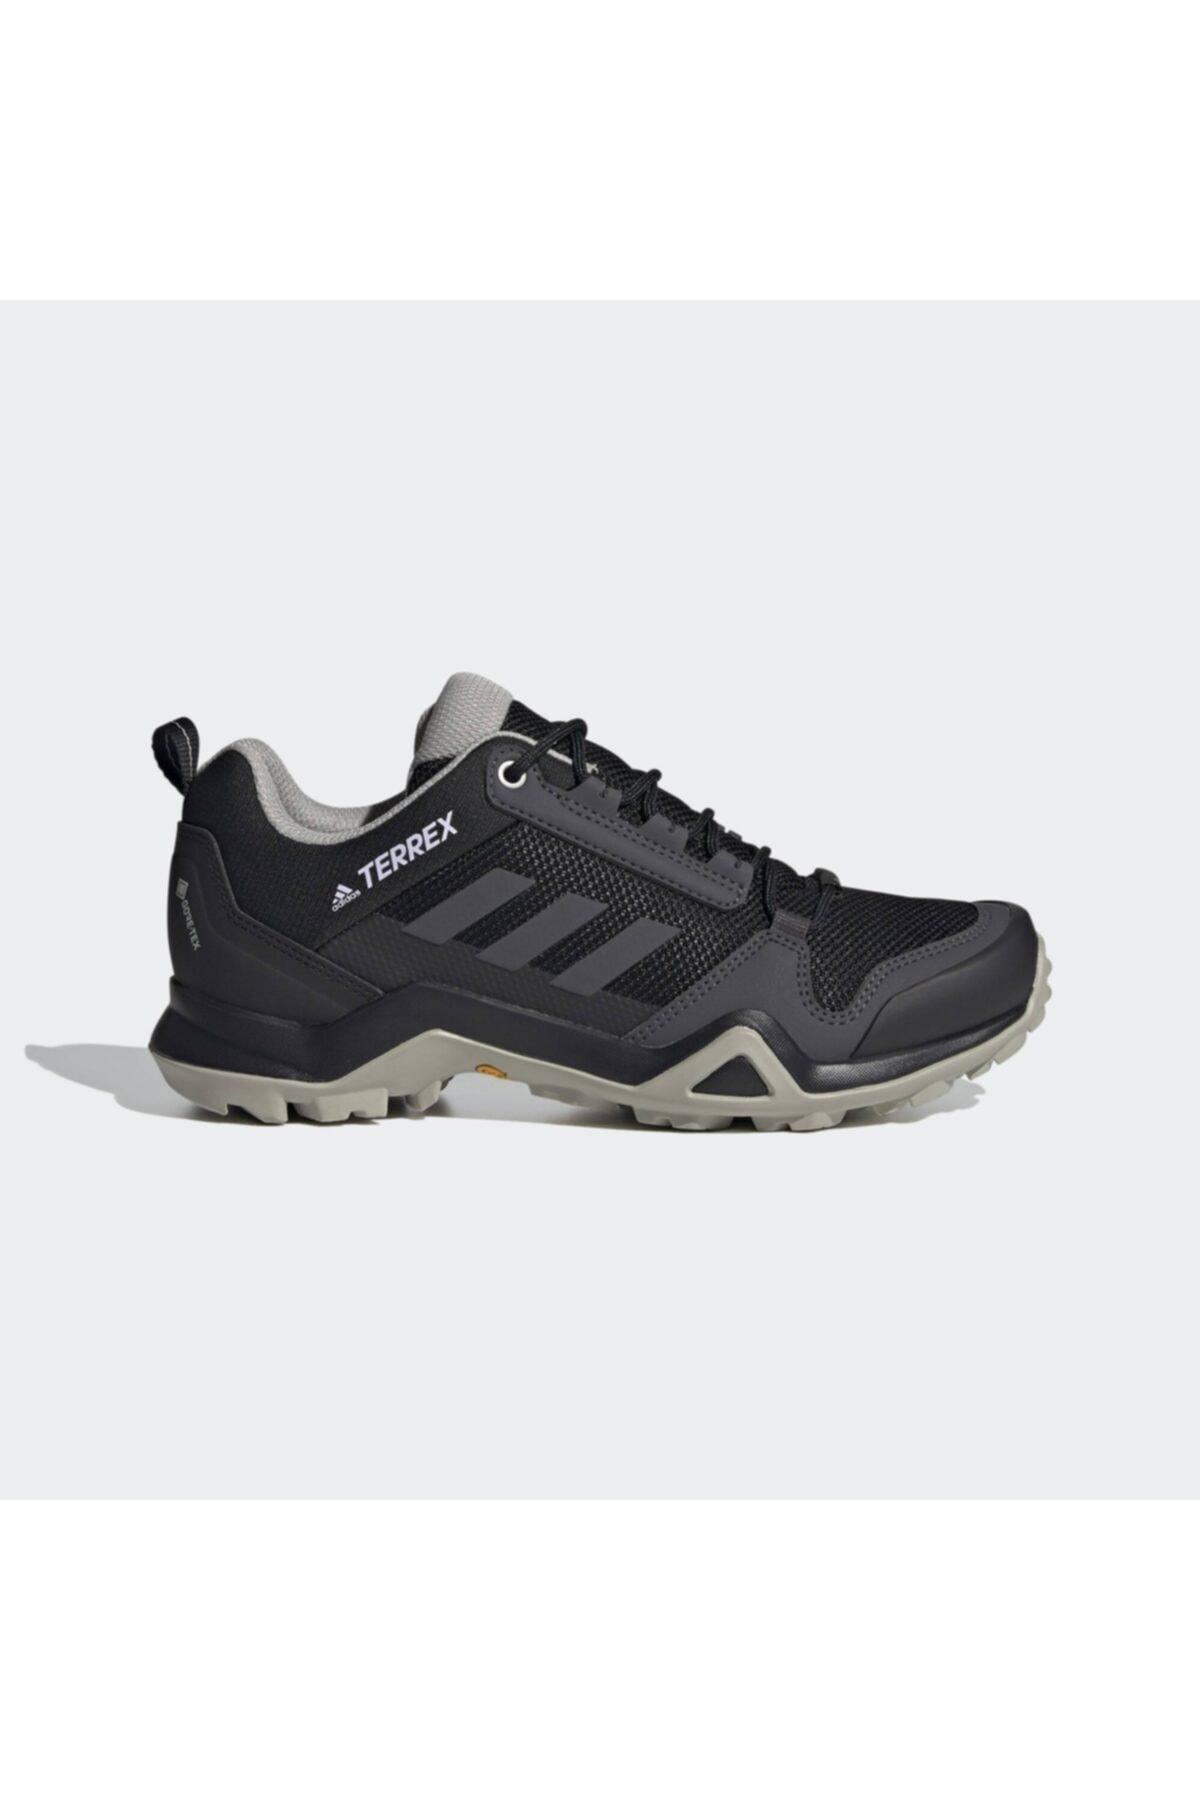 adidas Kadın Siyah Outdoor Ayakkabı Terrex Ax3 Gtx W Ef3510 1